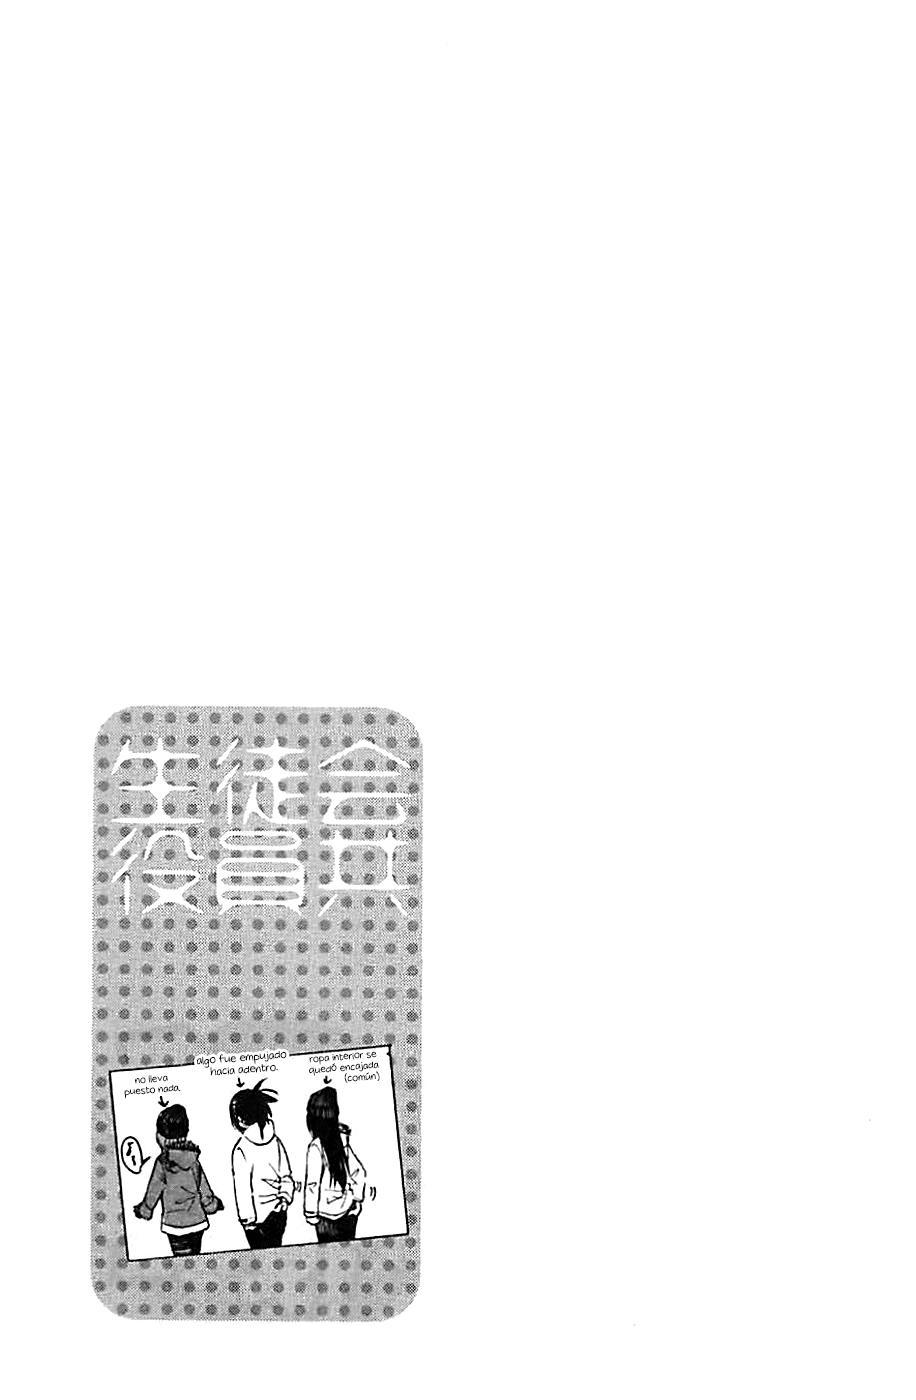 http://c5.ninemanga.com/es_manga/2/17602/412440/60598e1e451acc1e345b2404f477b9ad.jpg Page 6